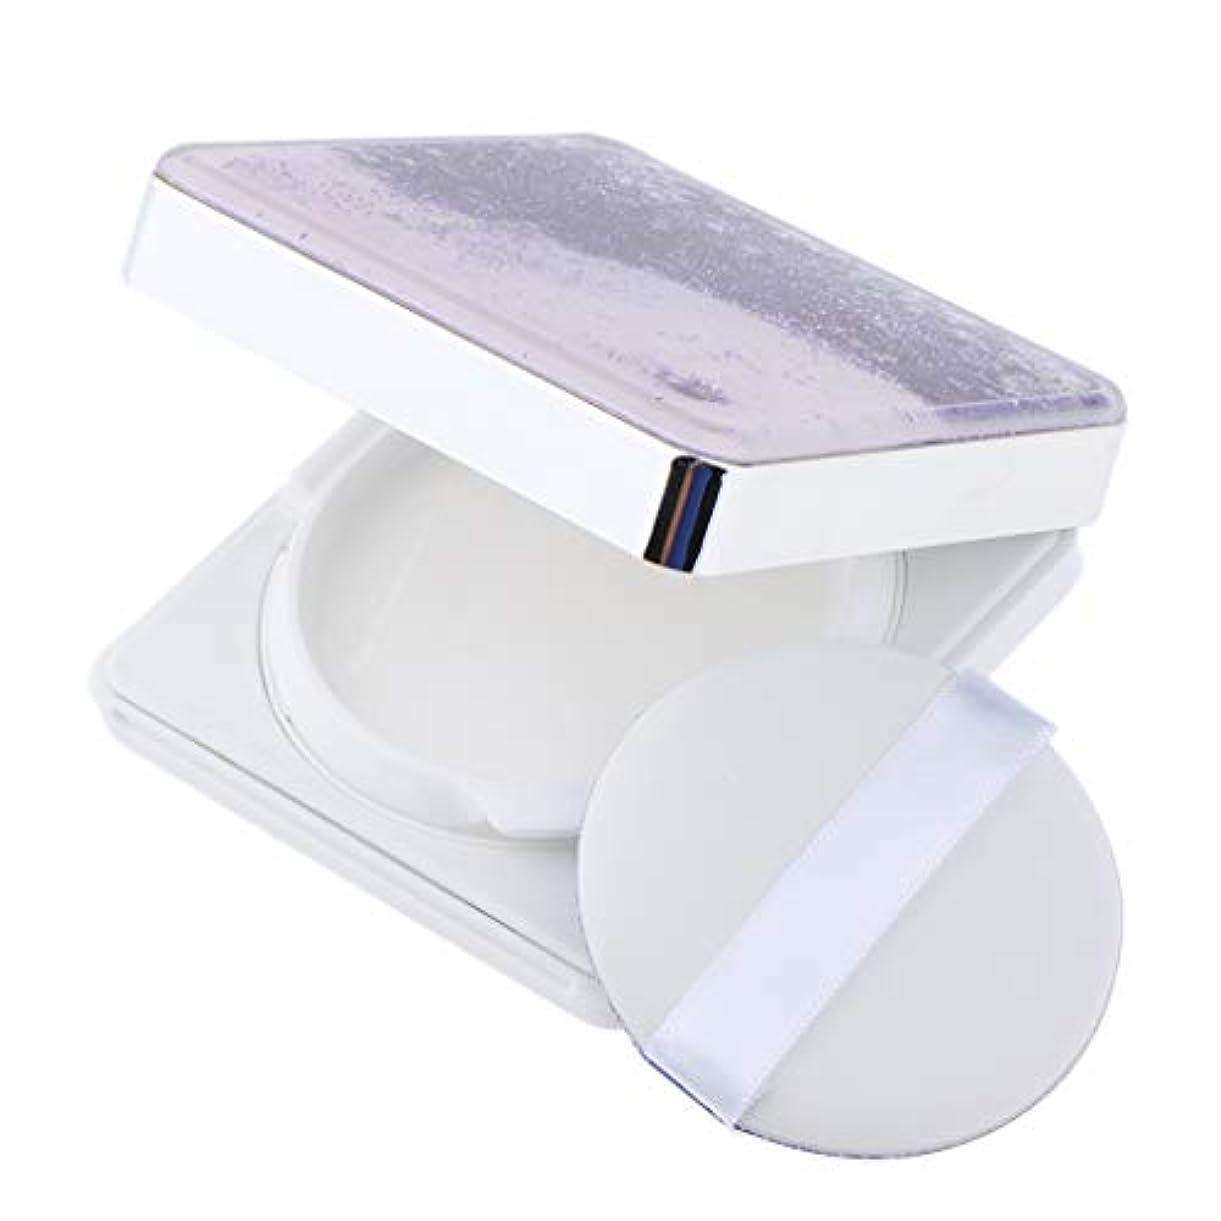 B Blesiya エアクッションケース パフ 空ケース DIY コスメ 旅行小物 3色選べ - 紫